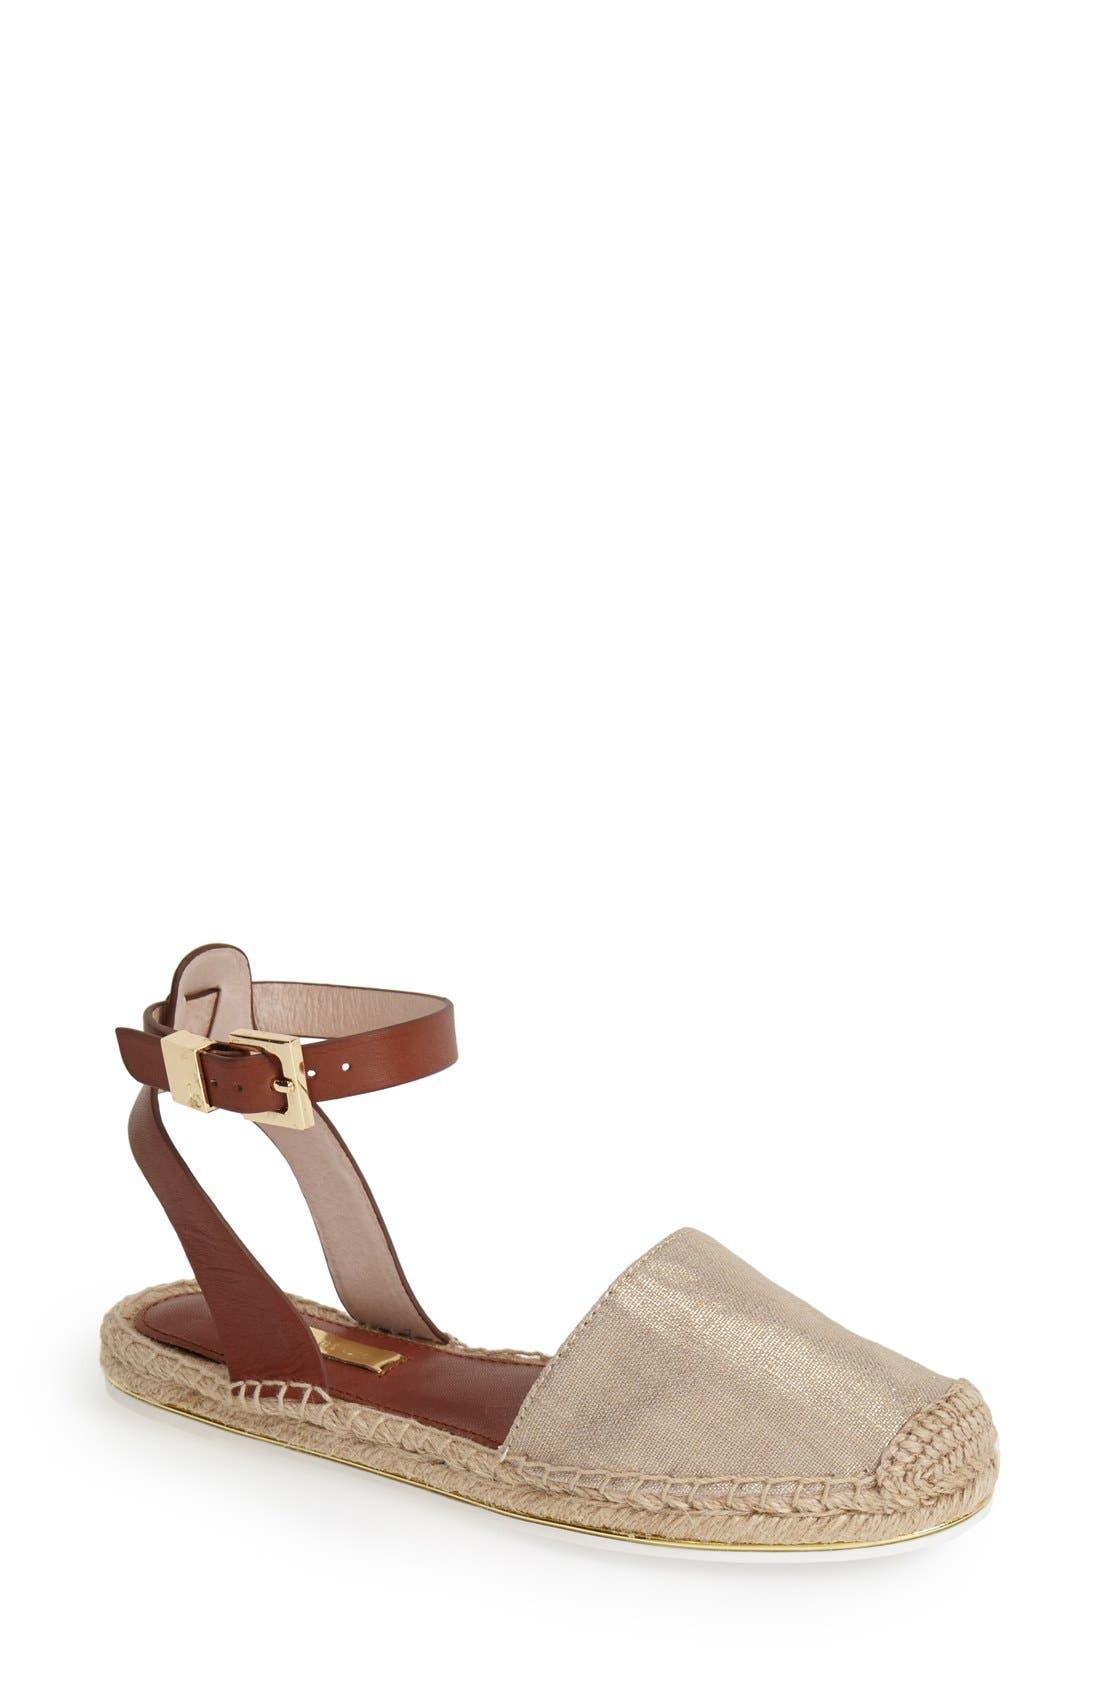 Alternate Image 1 Selected - Louise et Cie 'Frida' Ankle Strap Espadrille Flat (Women)